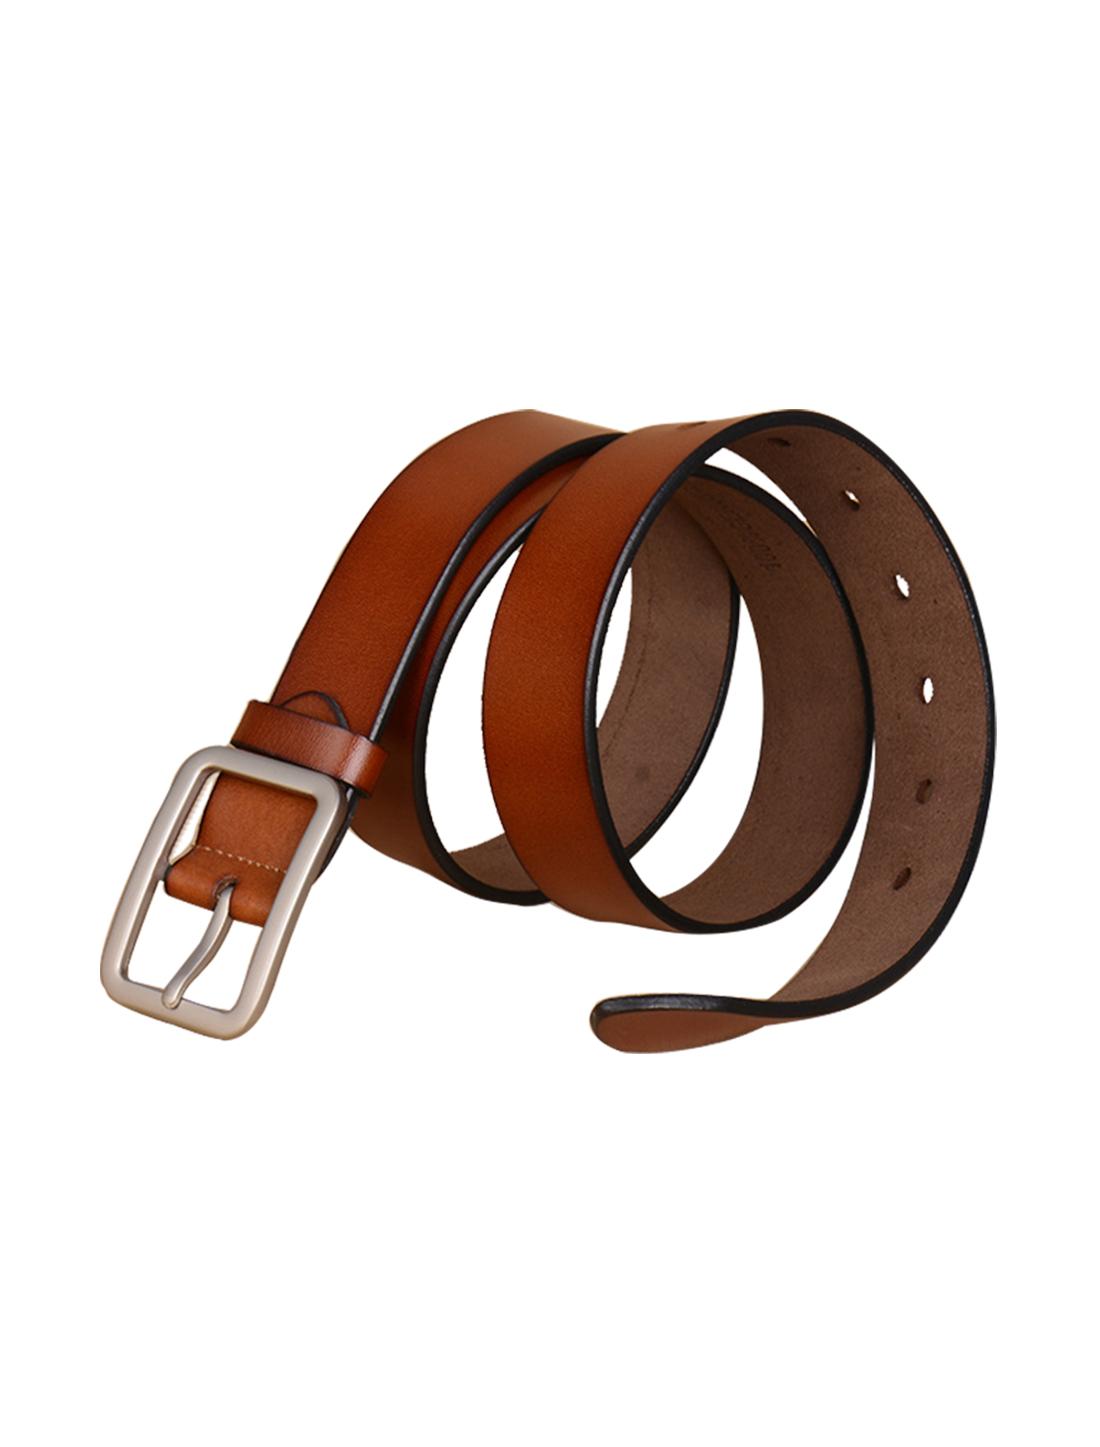 Mens Fashion Single Pin Buckle Leather Belt 33mm Width 1 1/4 Brown 120cm